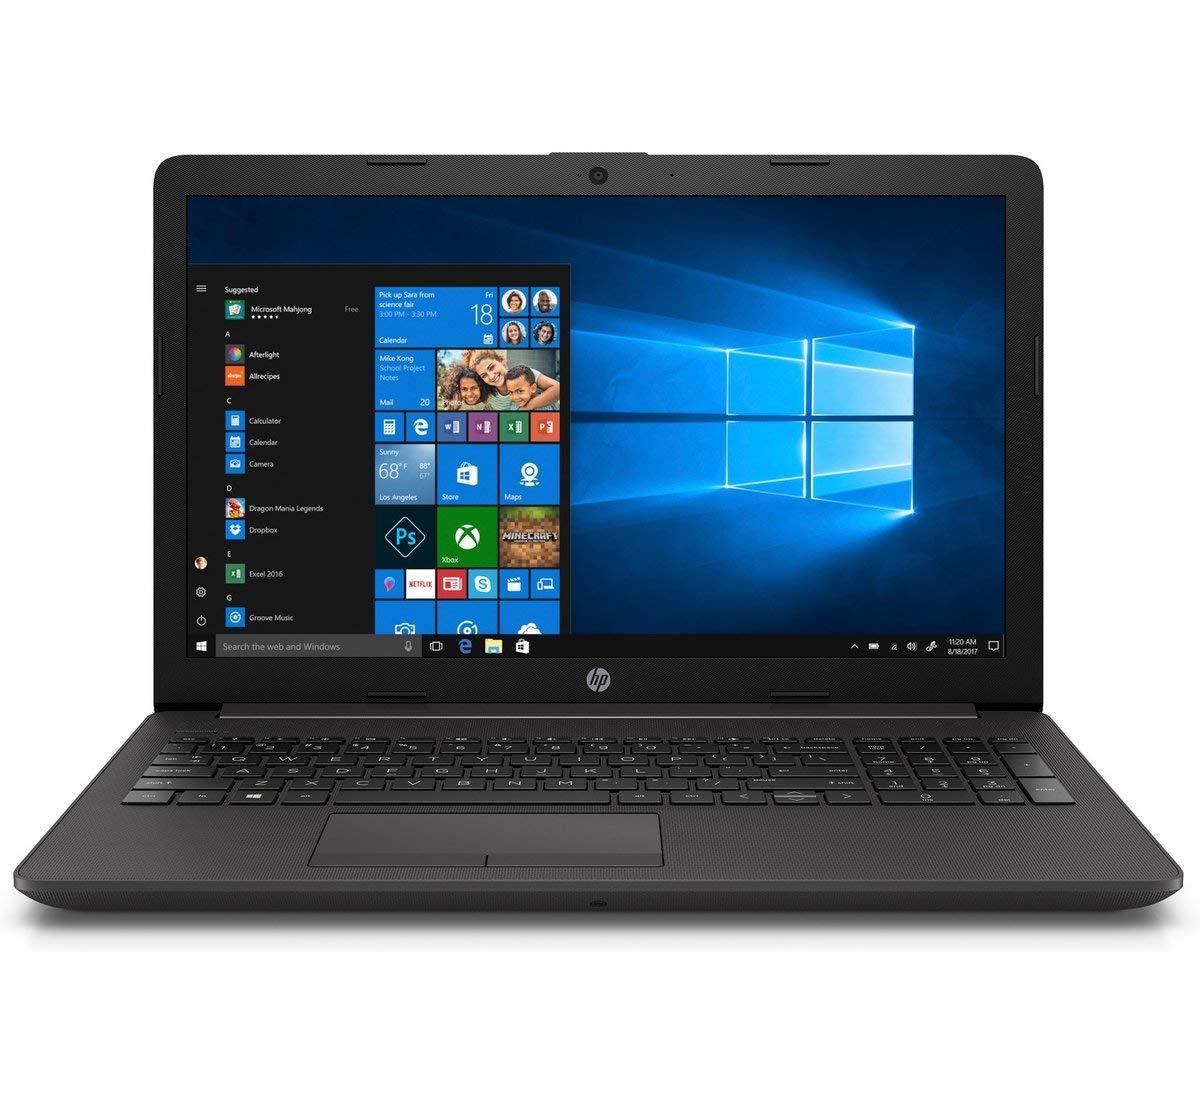 "HP 255 G7 AMD Ryzen 3, 15.6"", 8GB RAM, 256GB SSD, Windows 10, Notebook - Black"